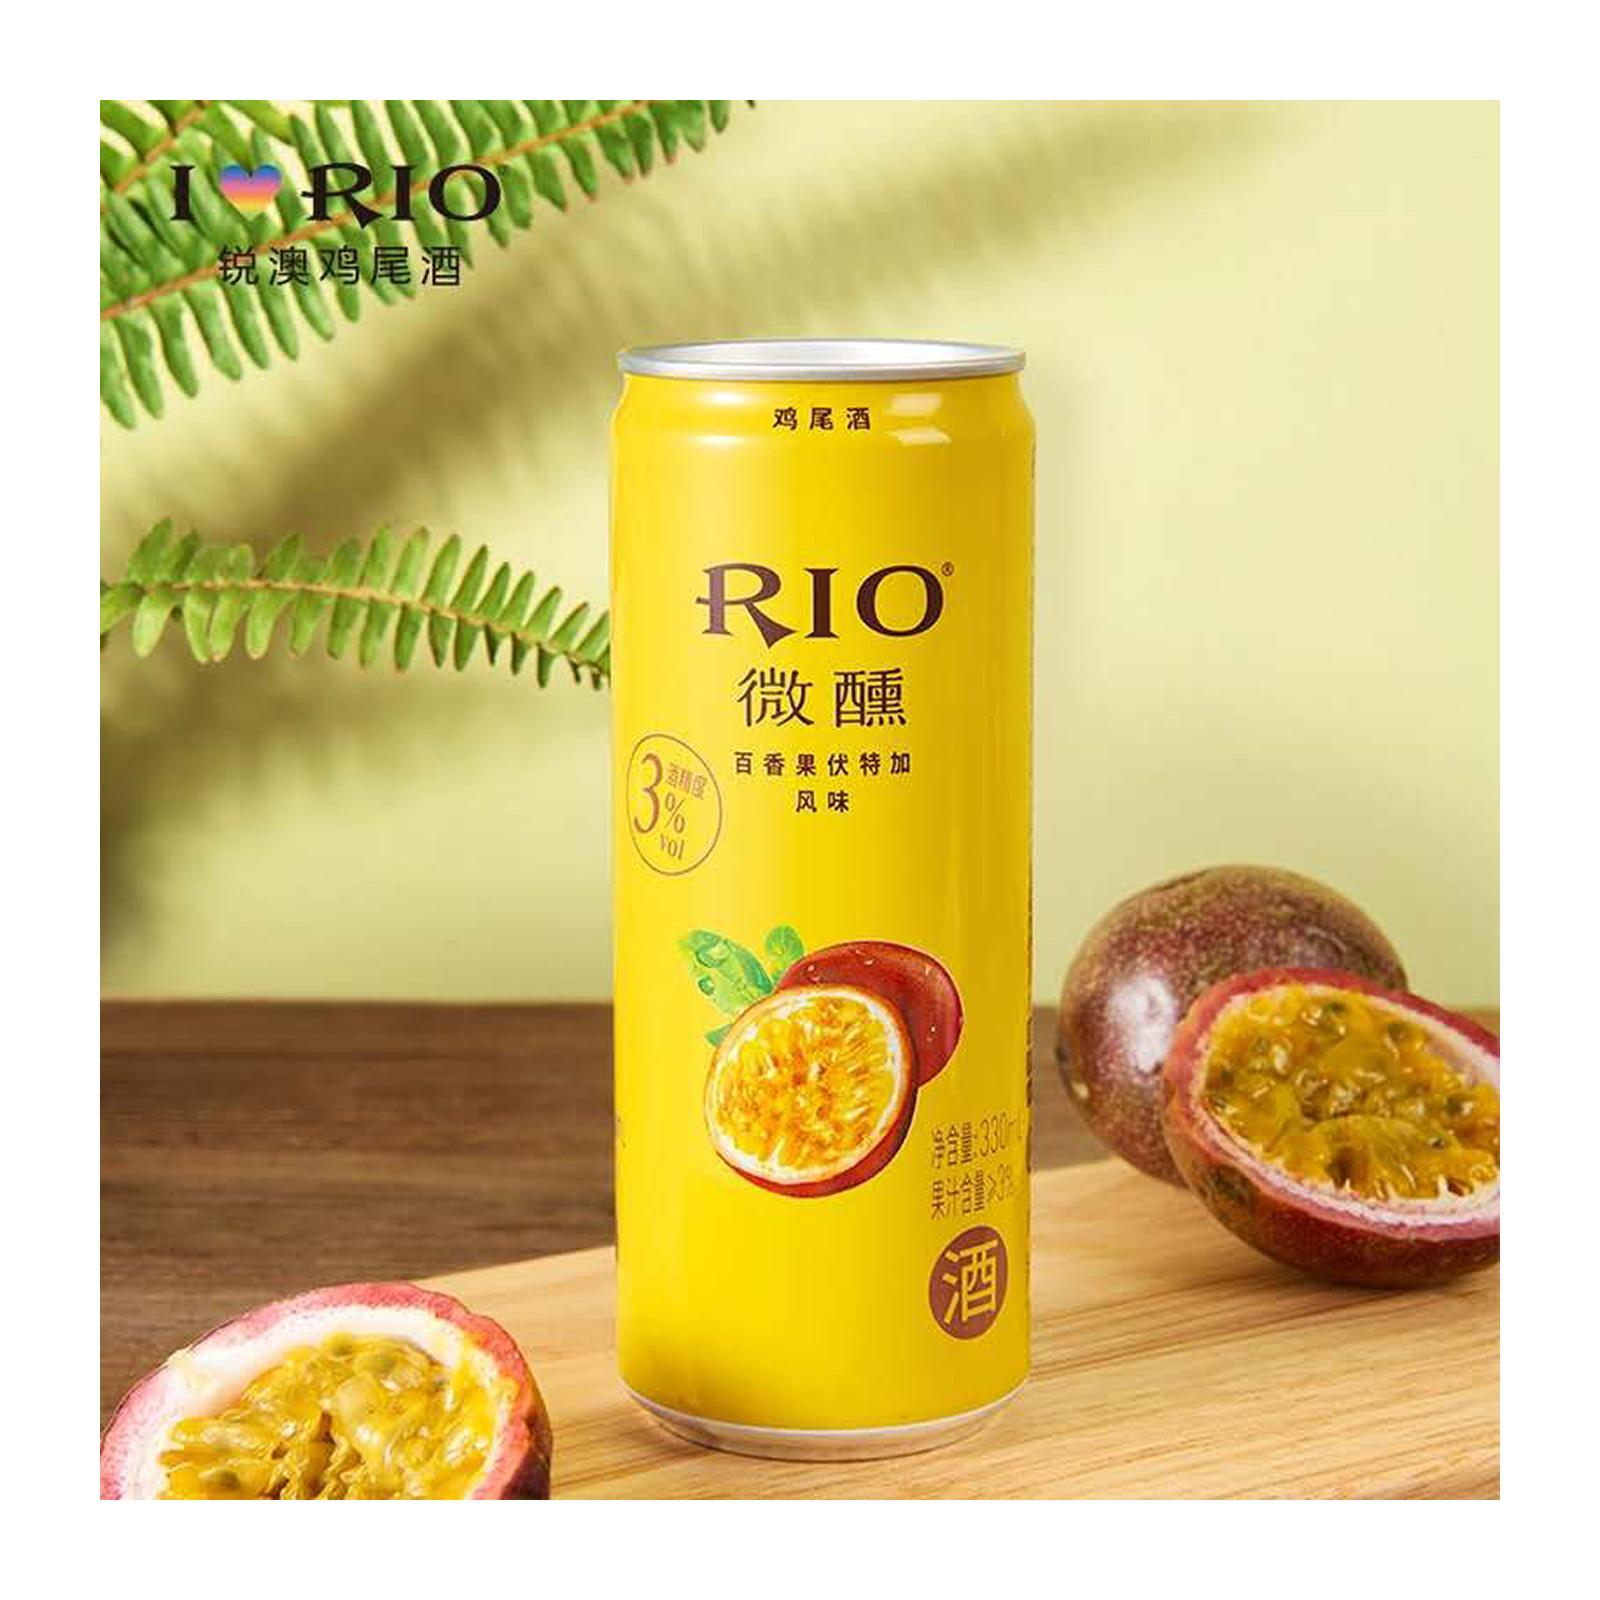 Rio Cocktail Passion Fruit+Brandy 3.0% 330Ml